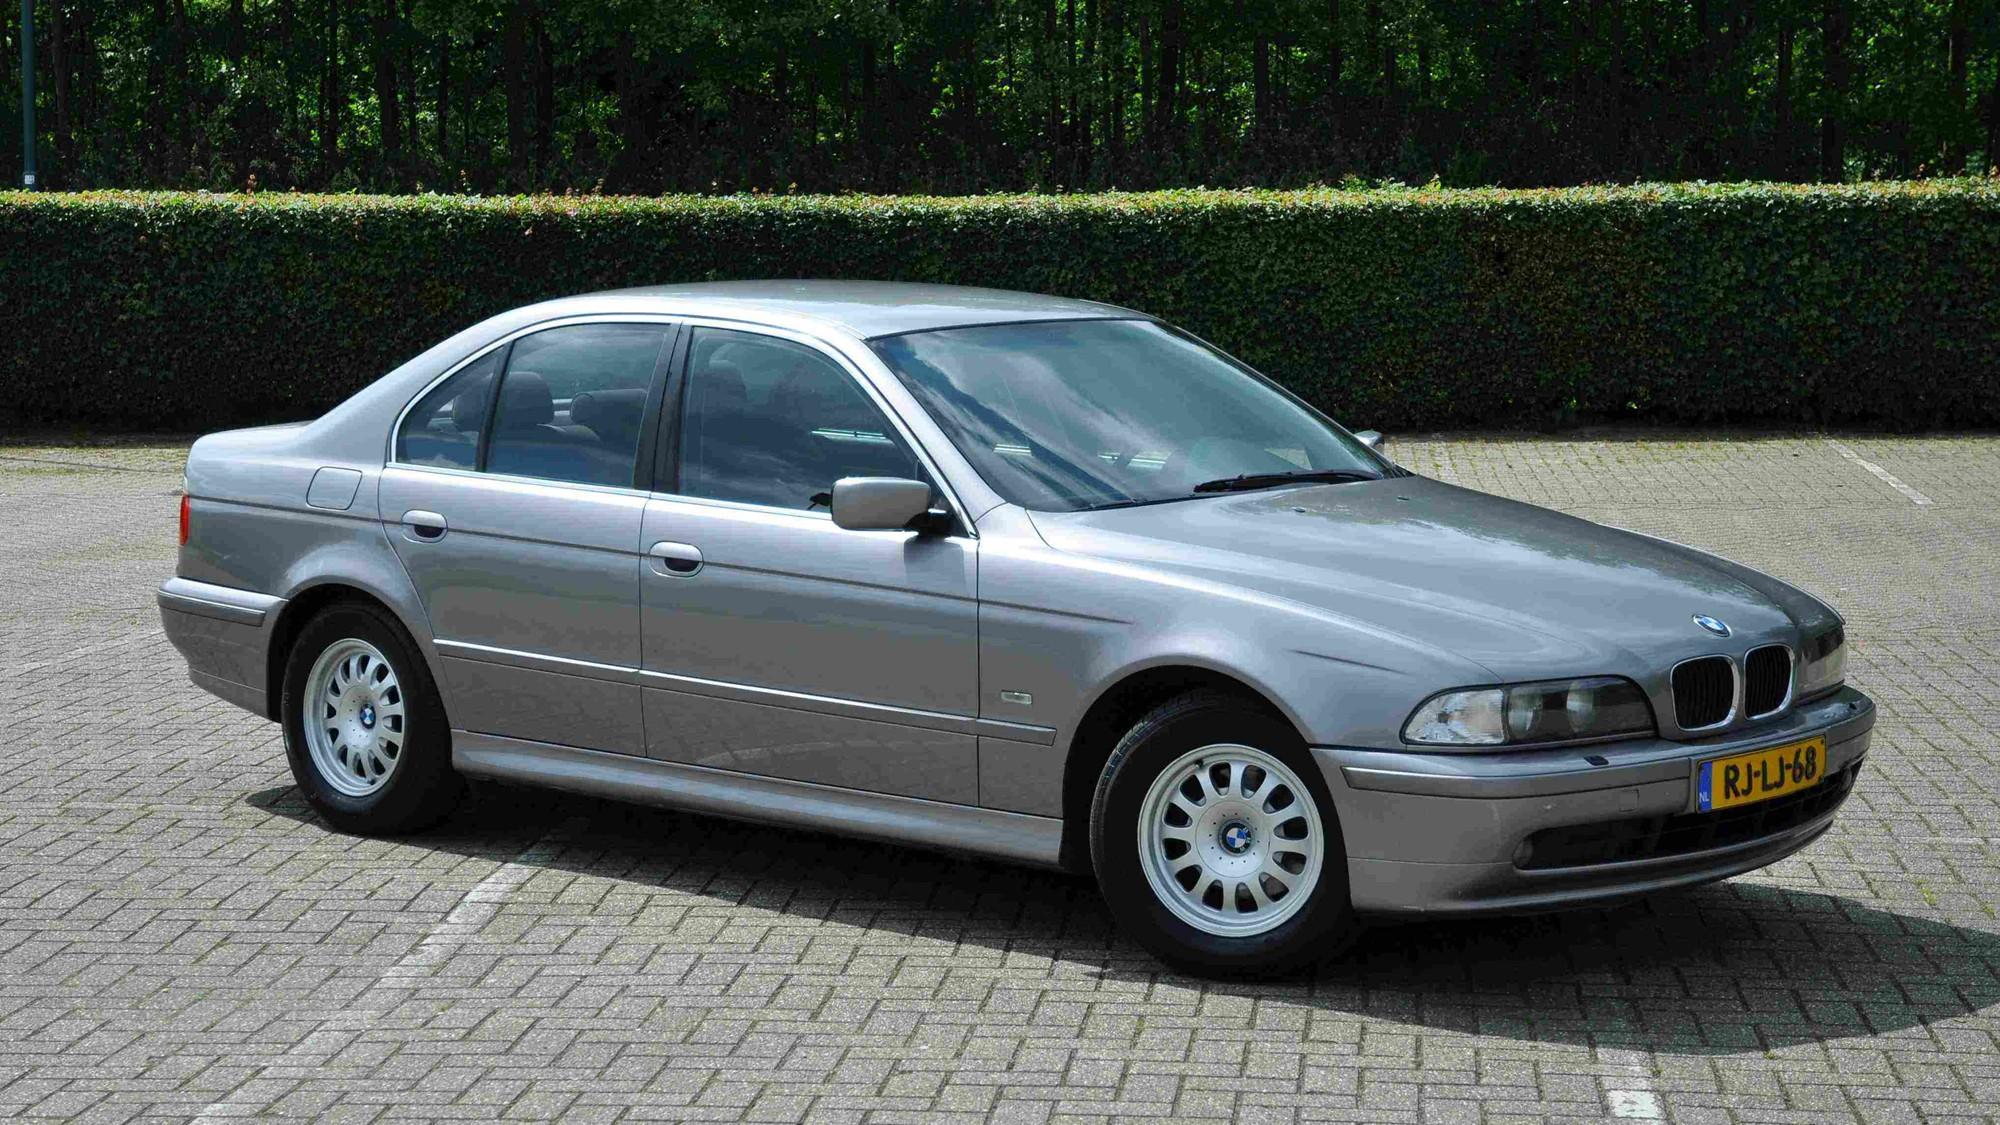 Elmark-online-automotive-content-marketing-1997-BMW-E39-523i-2000x1328